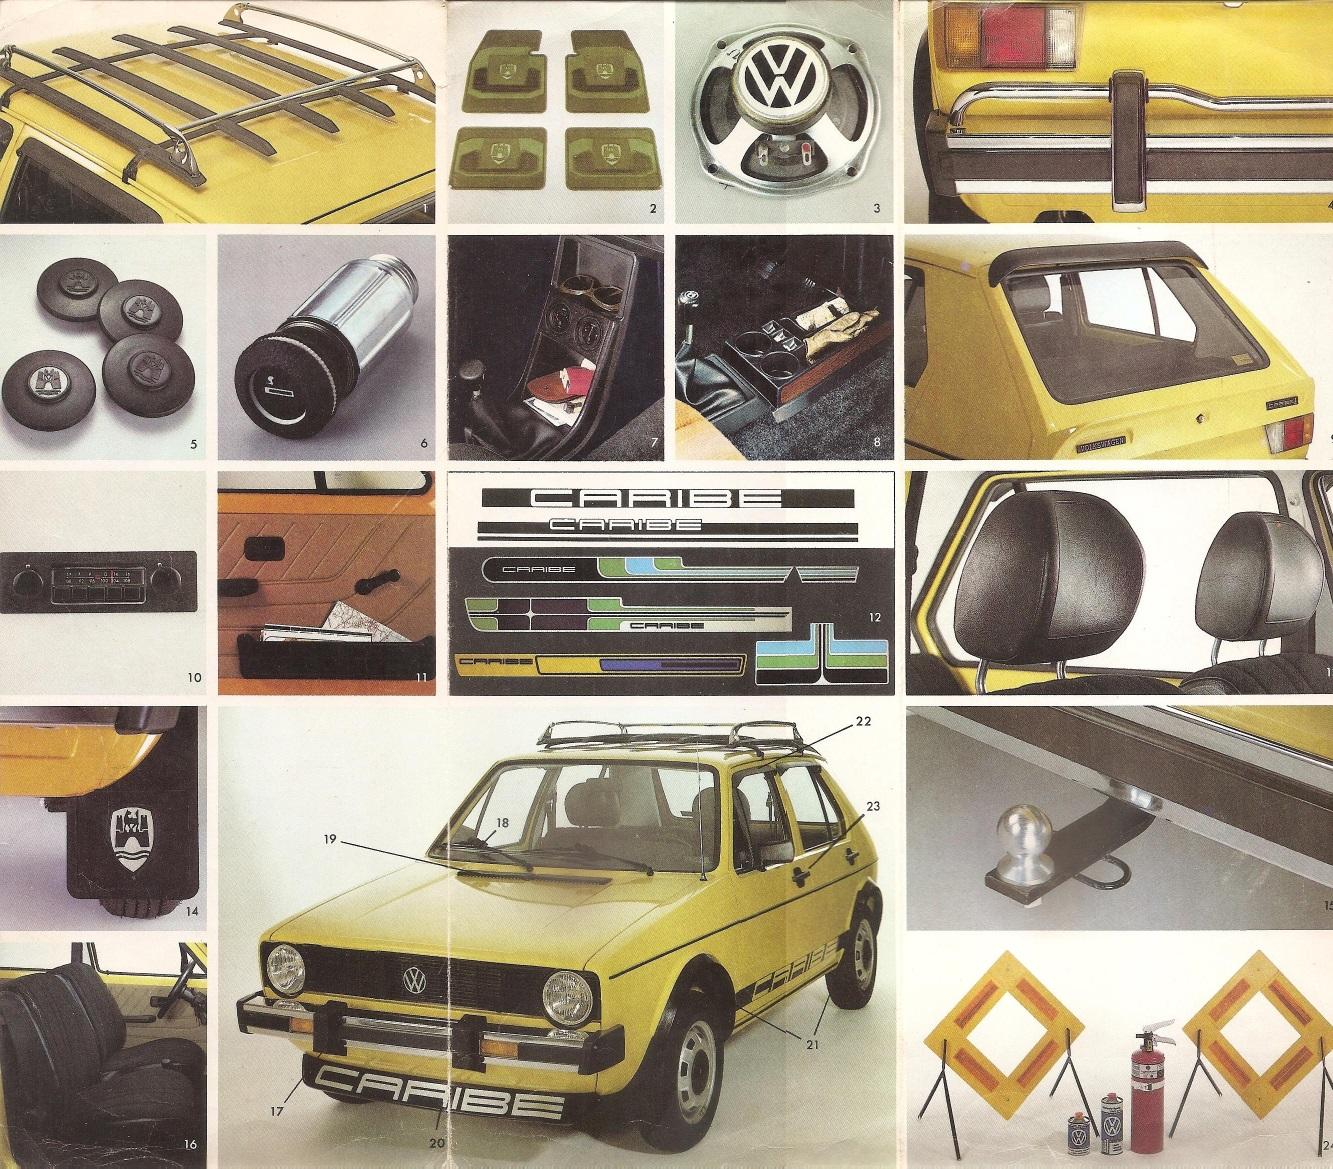 Thesamba Com    Vw Archives - 1979 Vw Rabbit Accessories